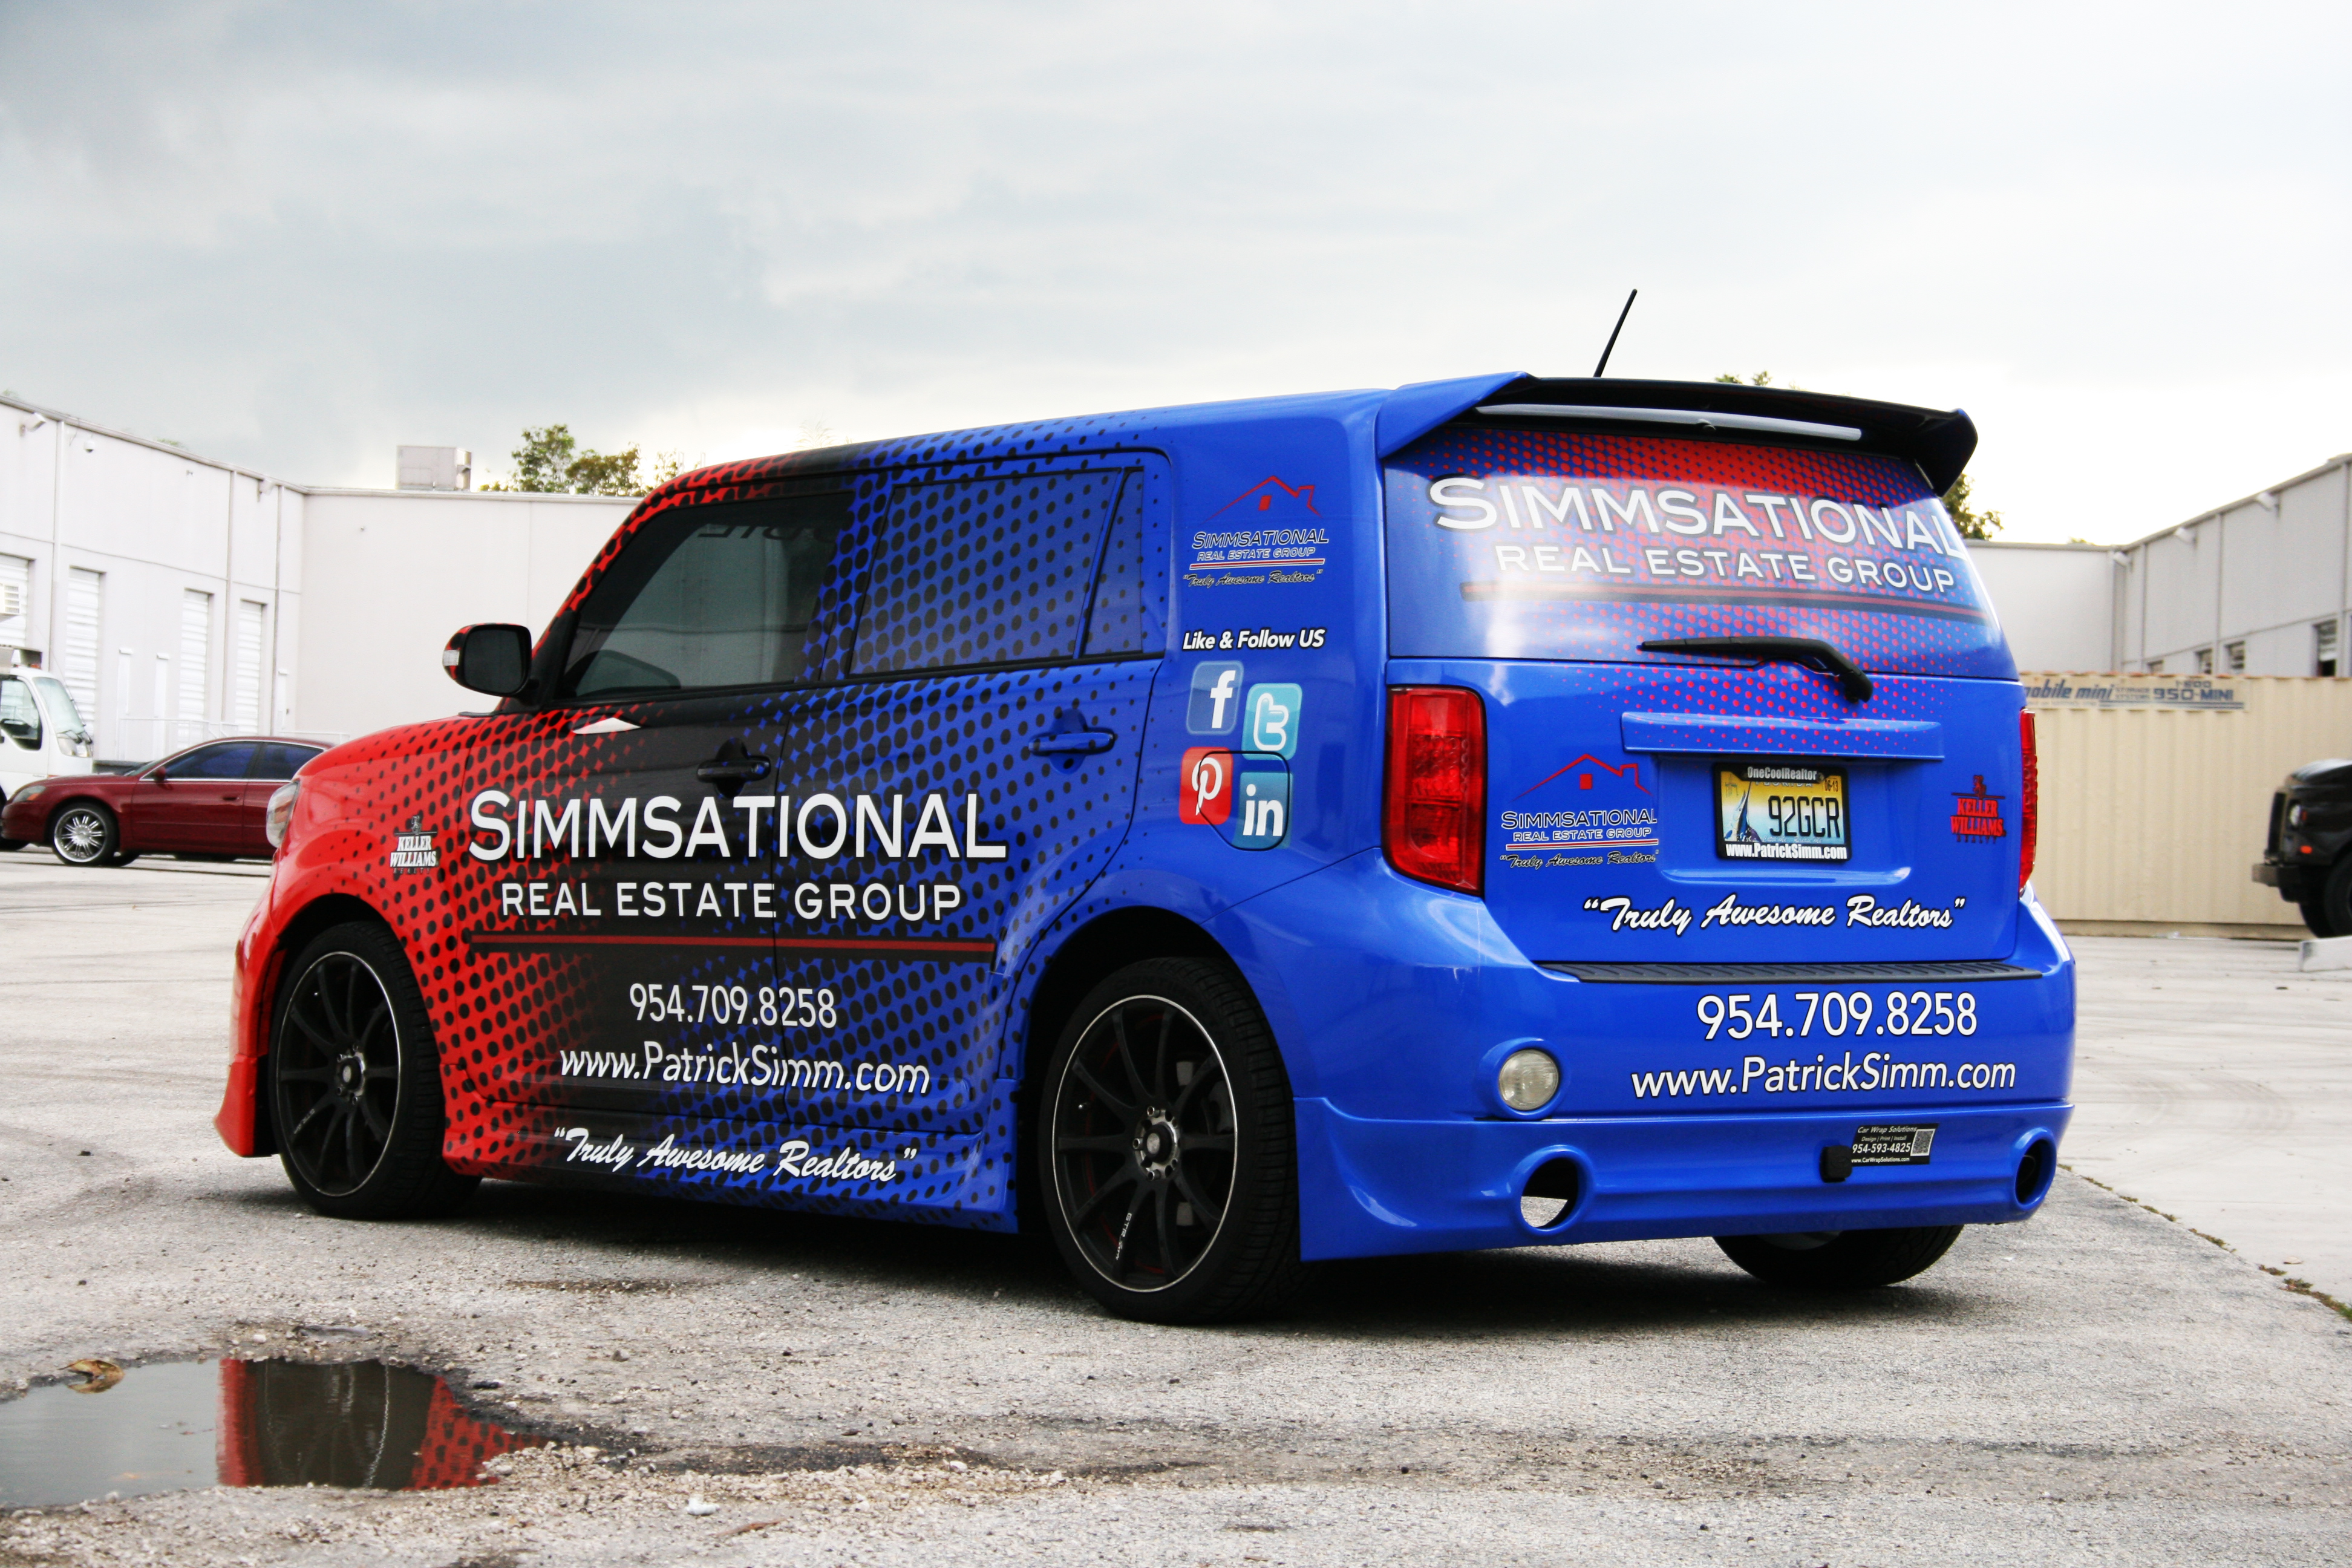 Car Real Estate: Vehicle Wrap Pembroke Pines Florida Simmsational Real Estate